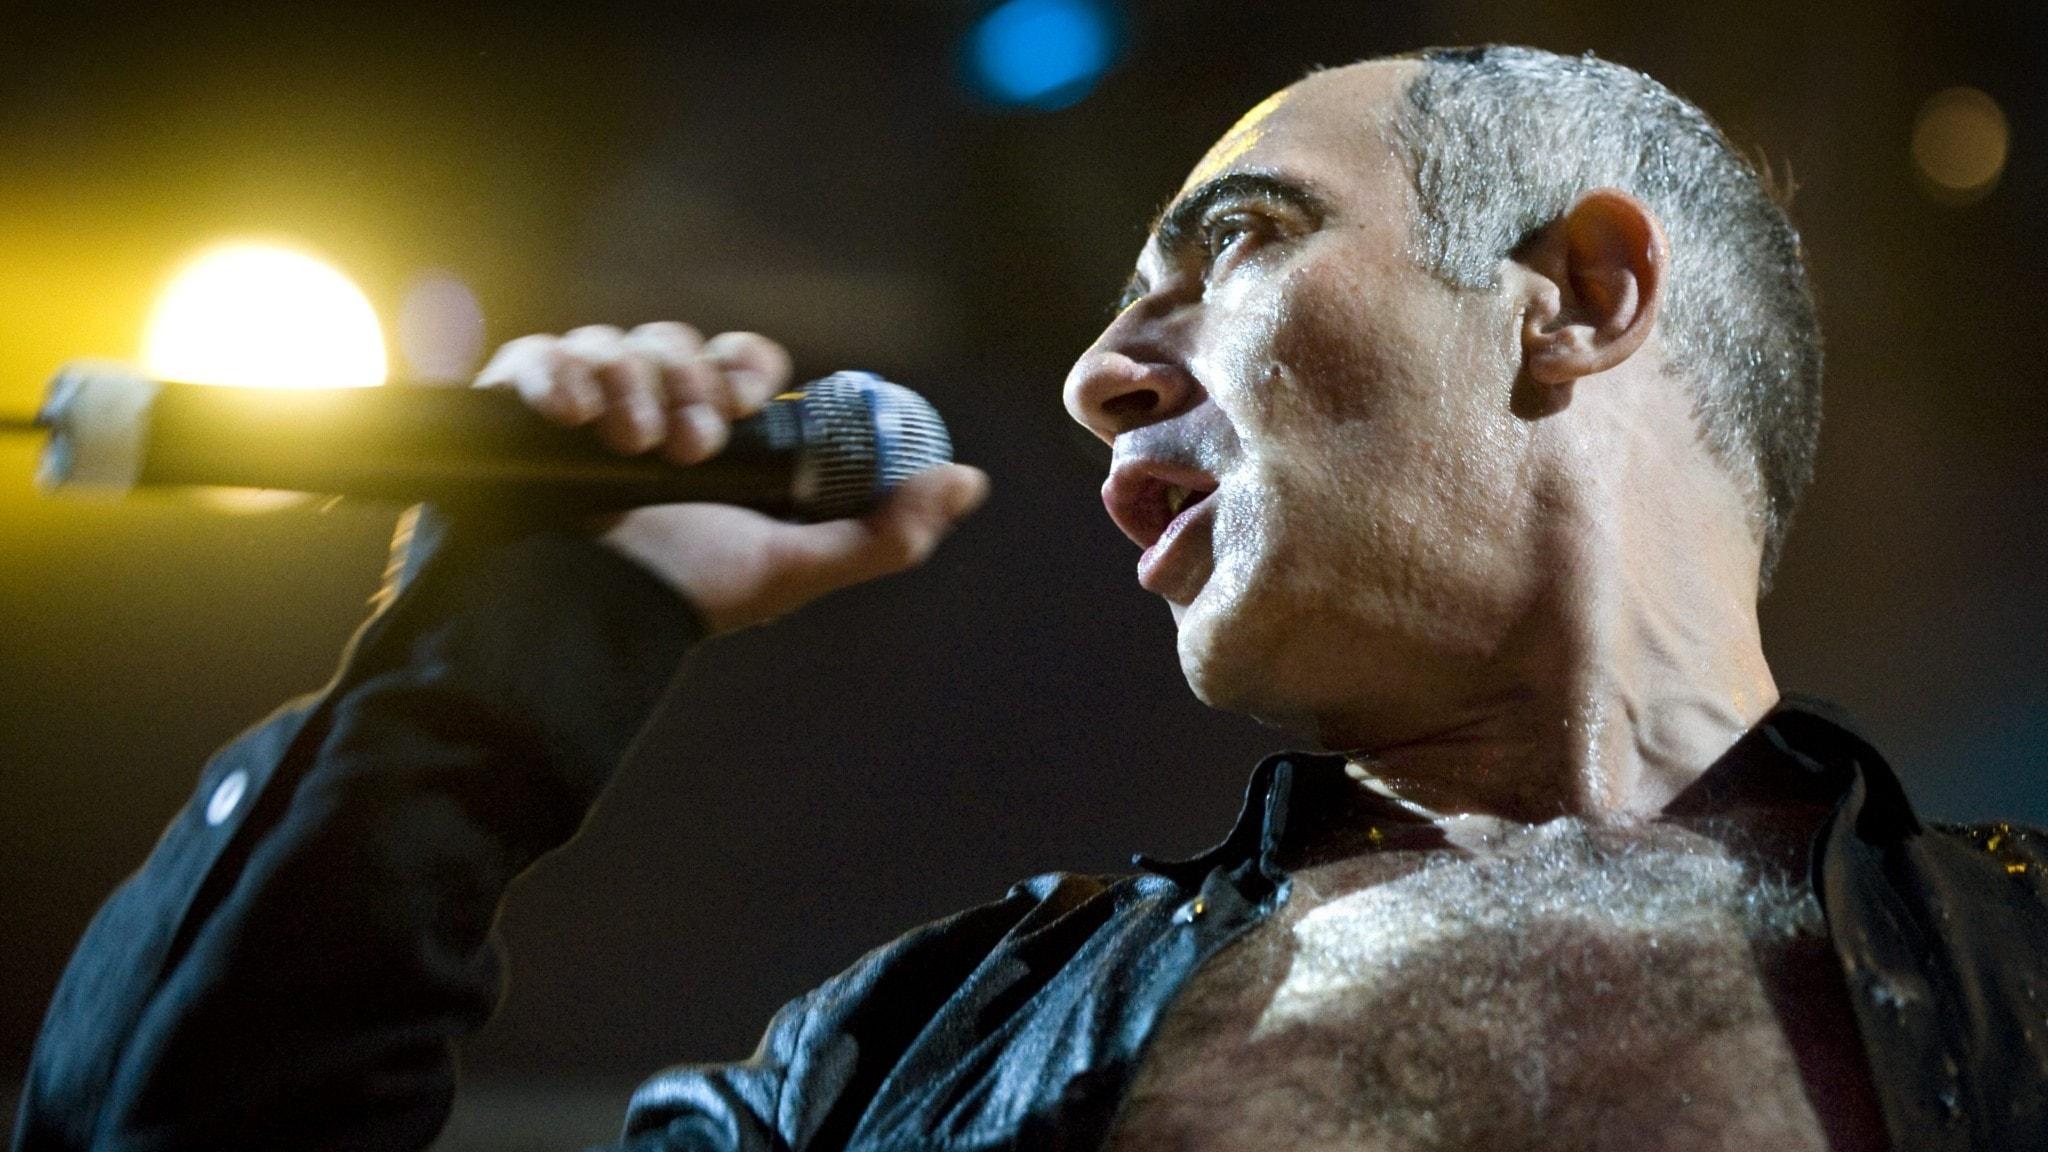 Gabi Delgado-Lopez sjunger i en mikrofon under Arvikafestivalen 2009.